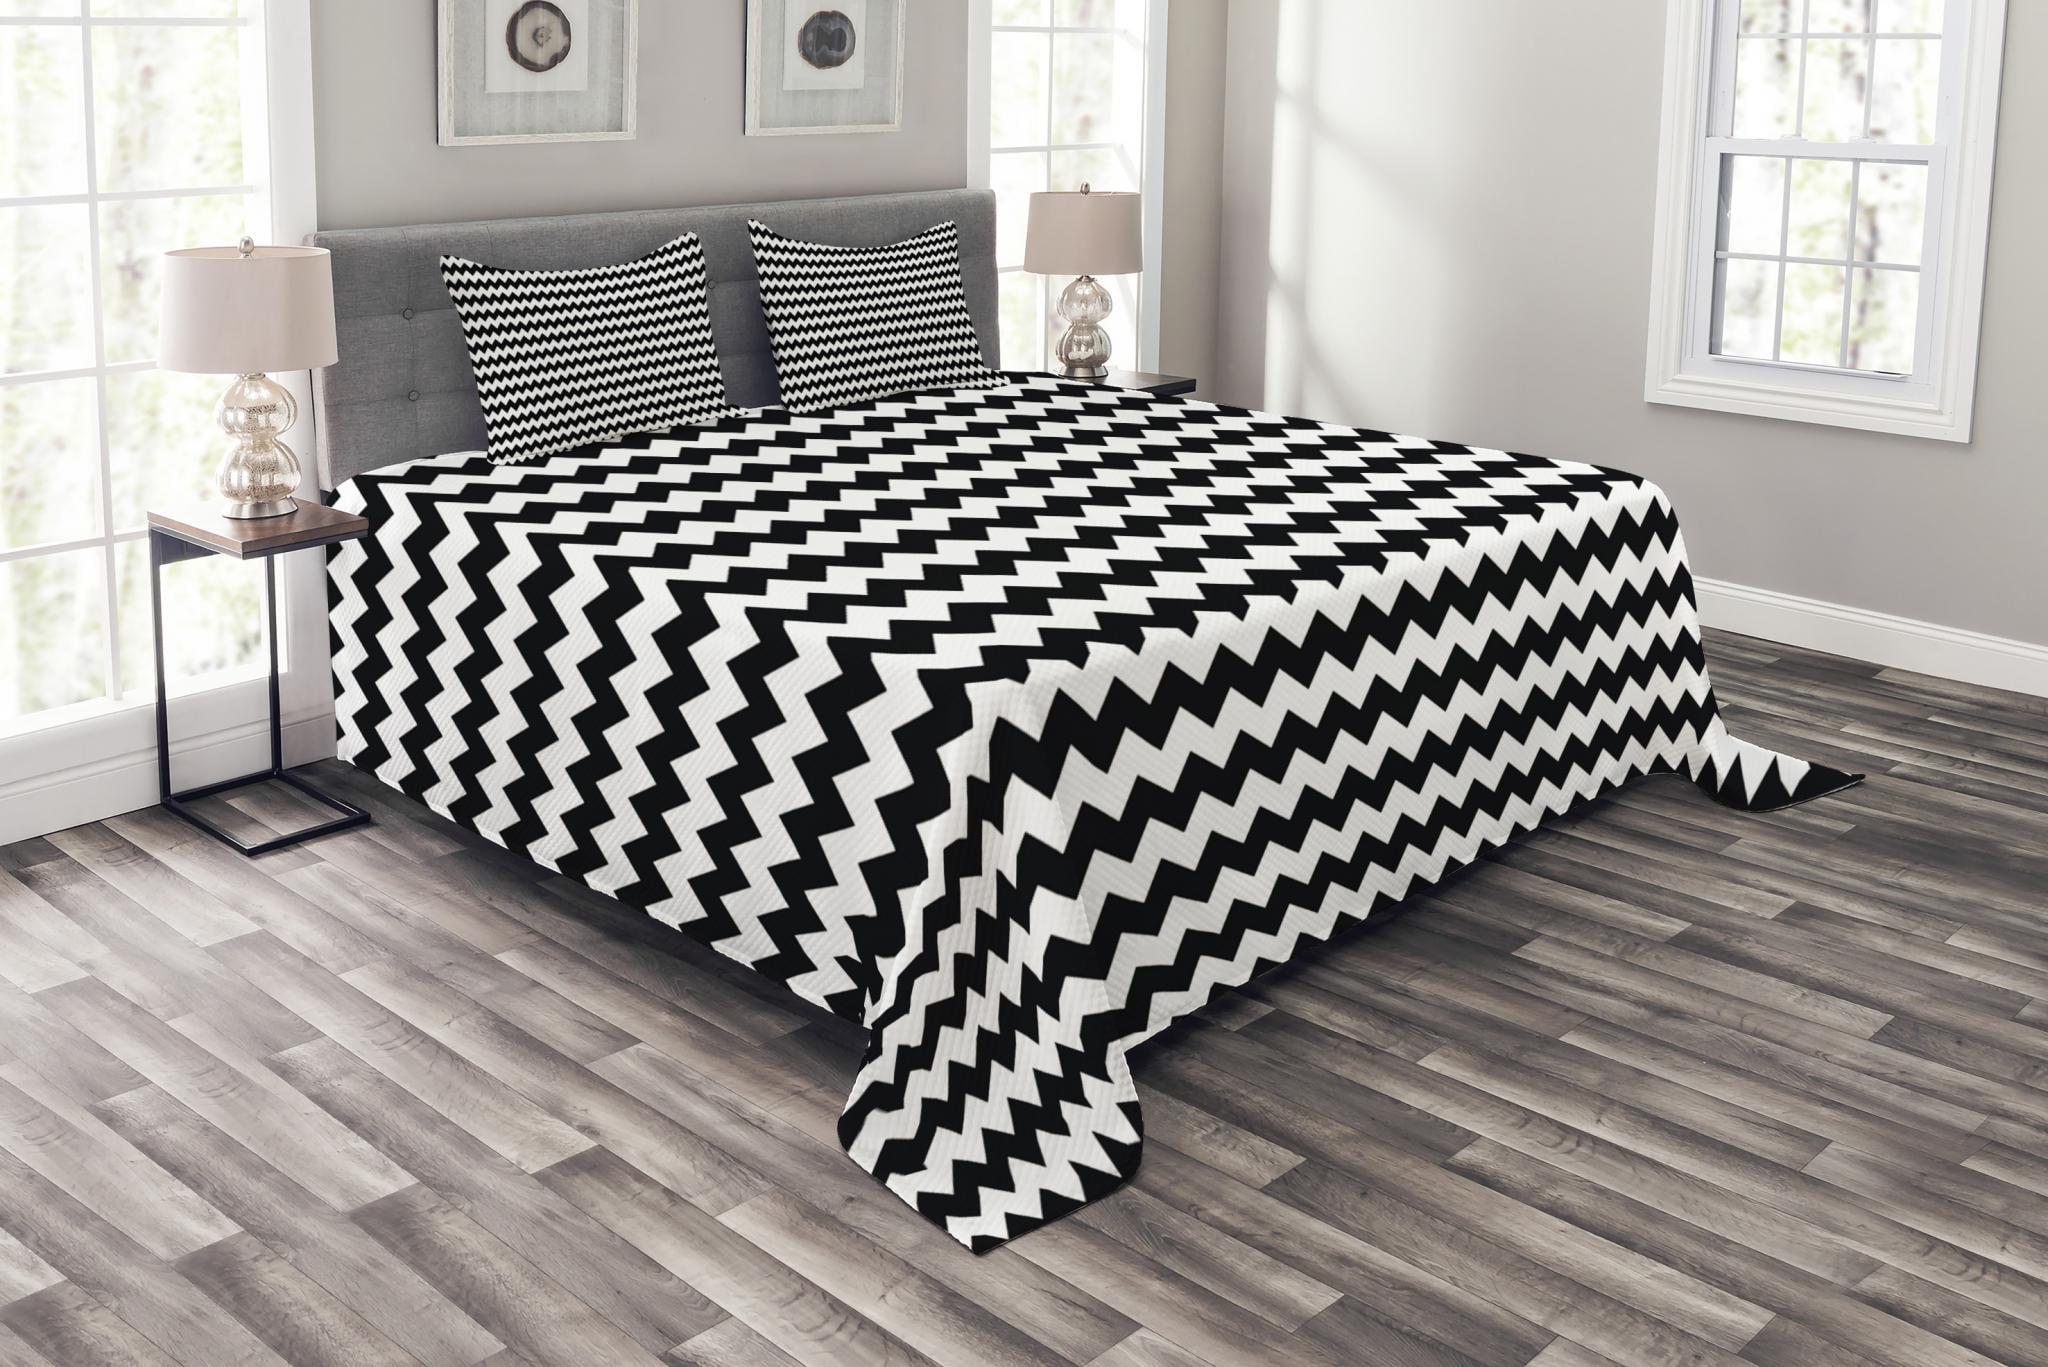 Chevron Bedspread Set Zig Zags In Black And White Sharp